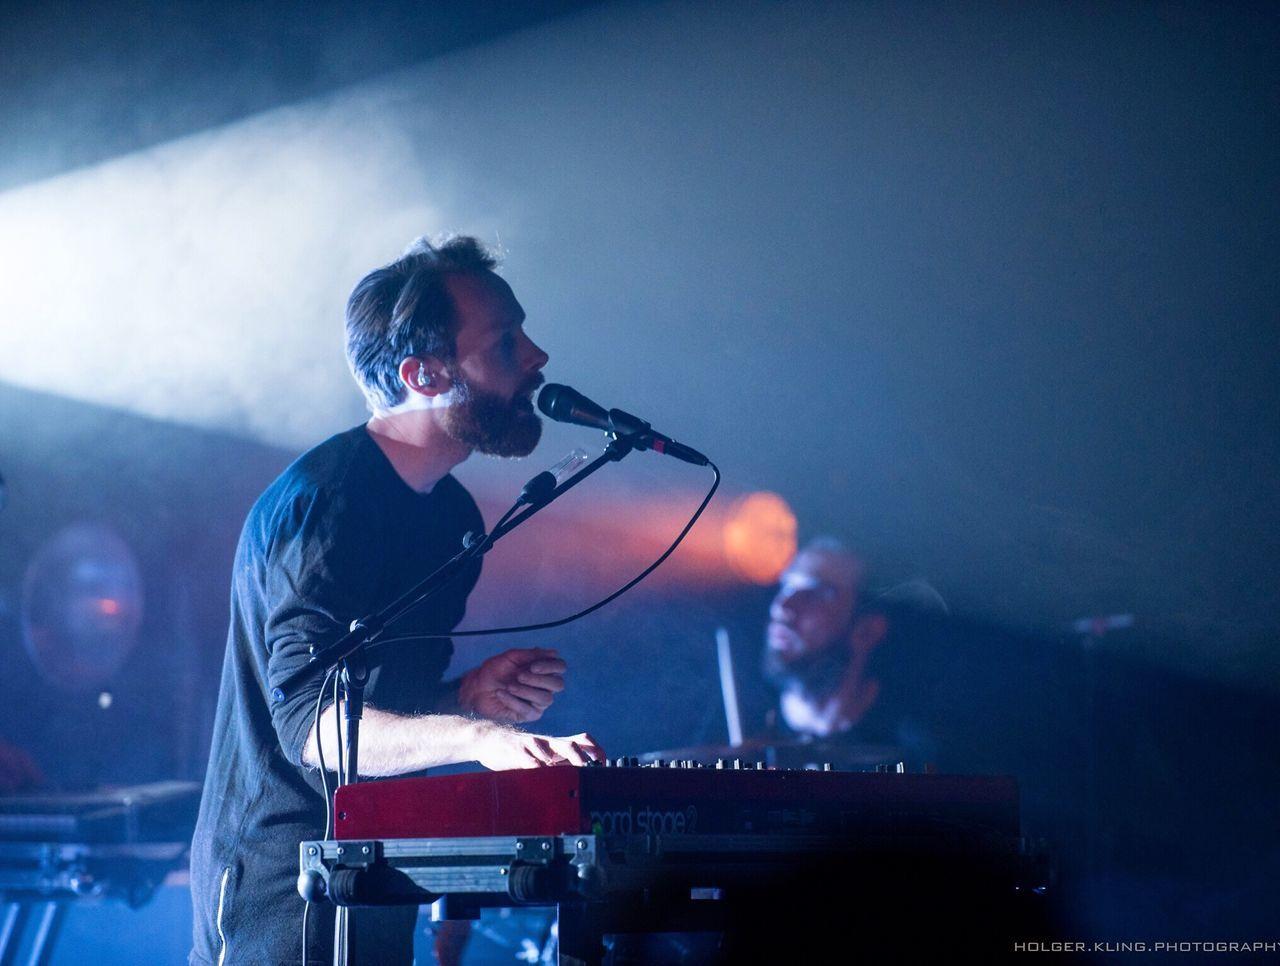 Enno Bunger live @roxyulm Enno Bunger Roxyulm Ulm Concert Photography Concert Nikon Nikonphotography